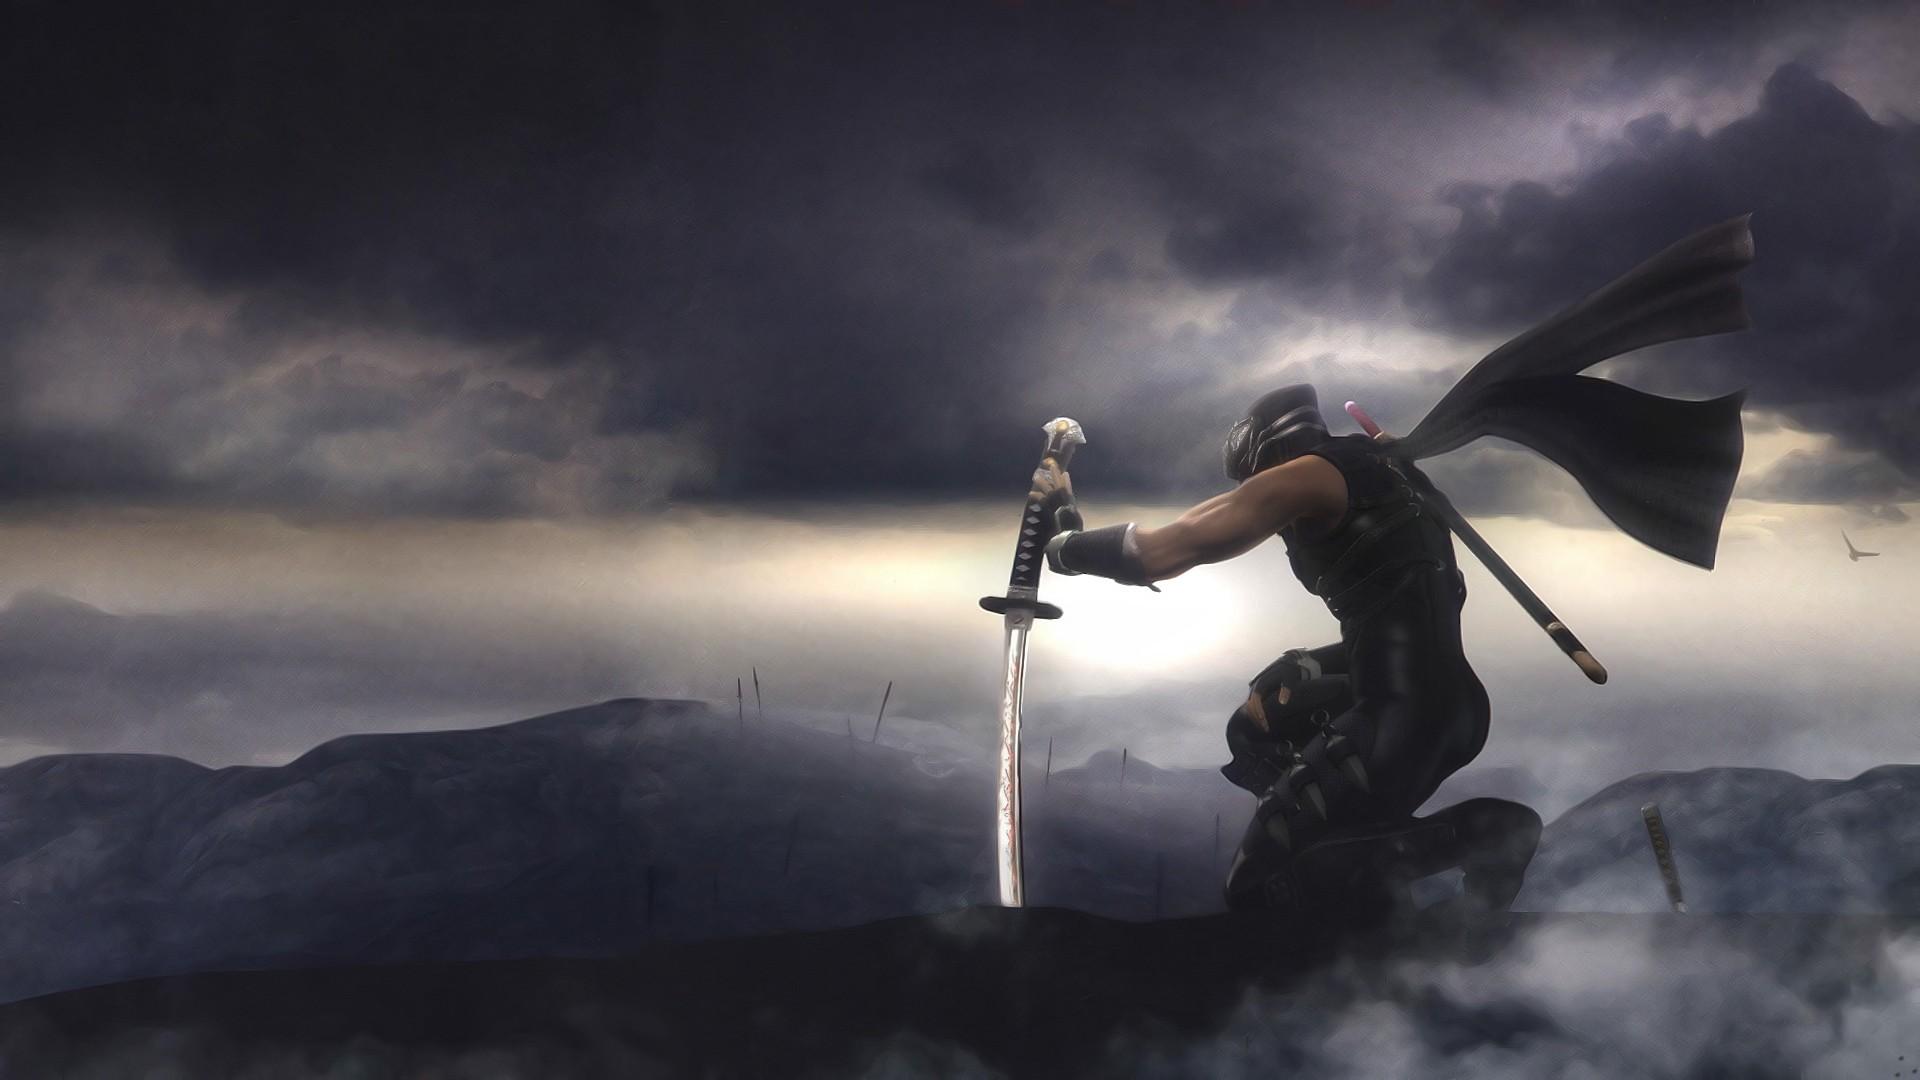 Ninja Gaiden Full HD Wallpaper And Background Image